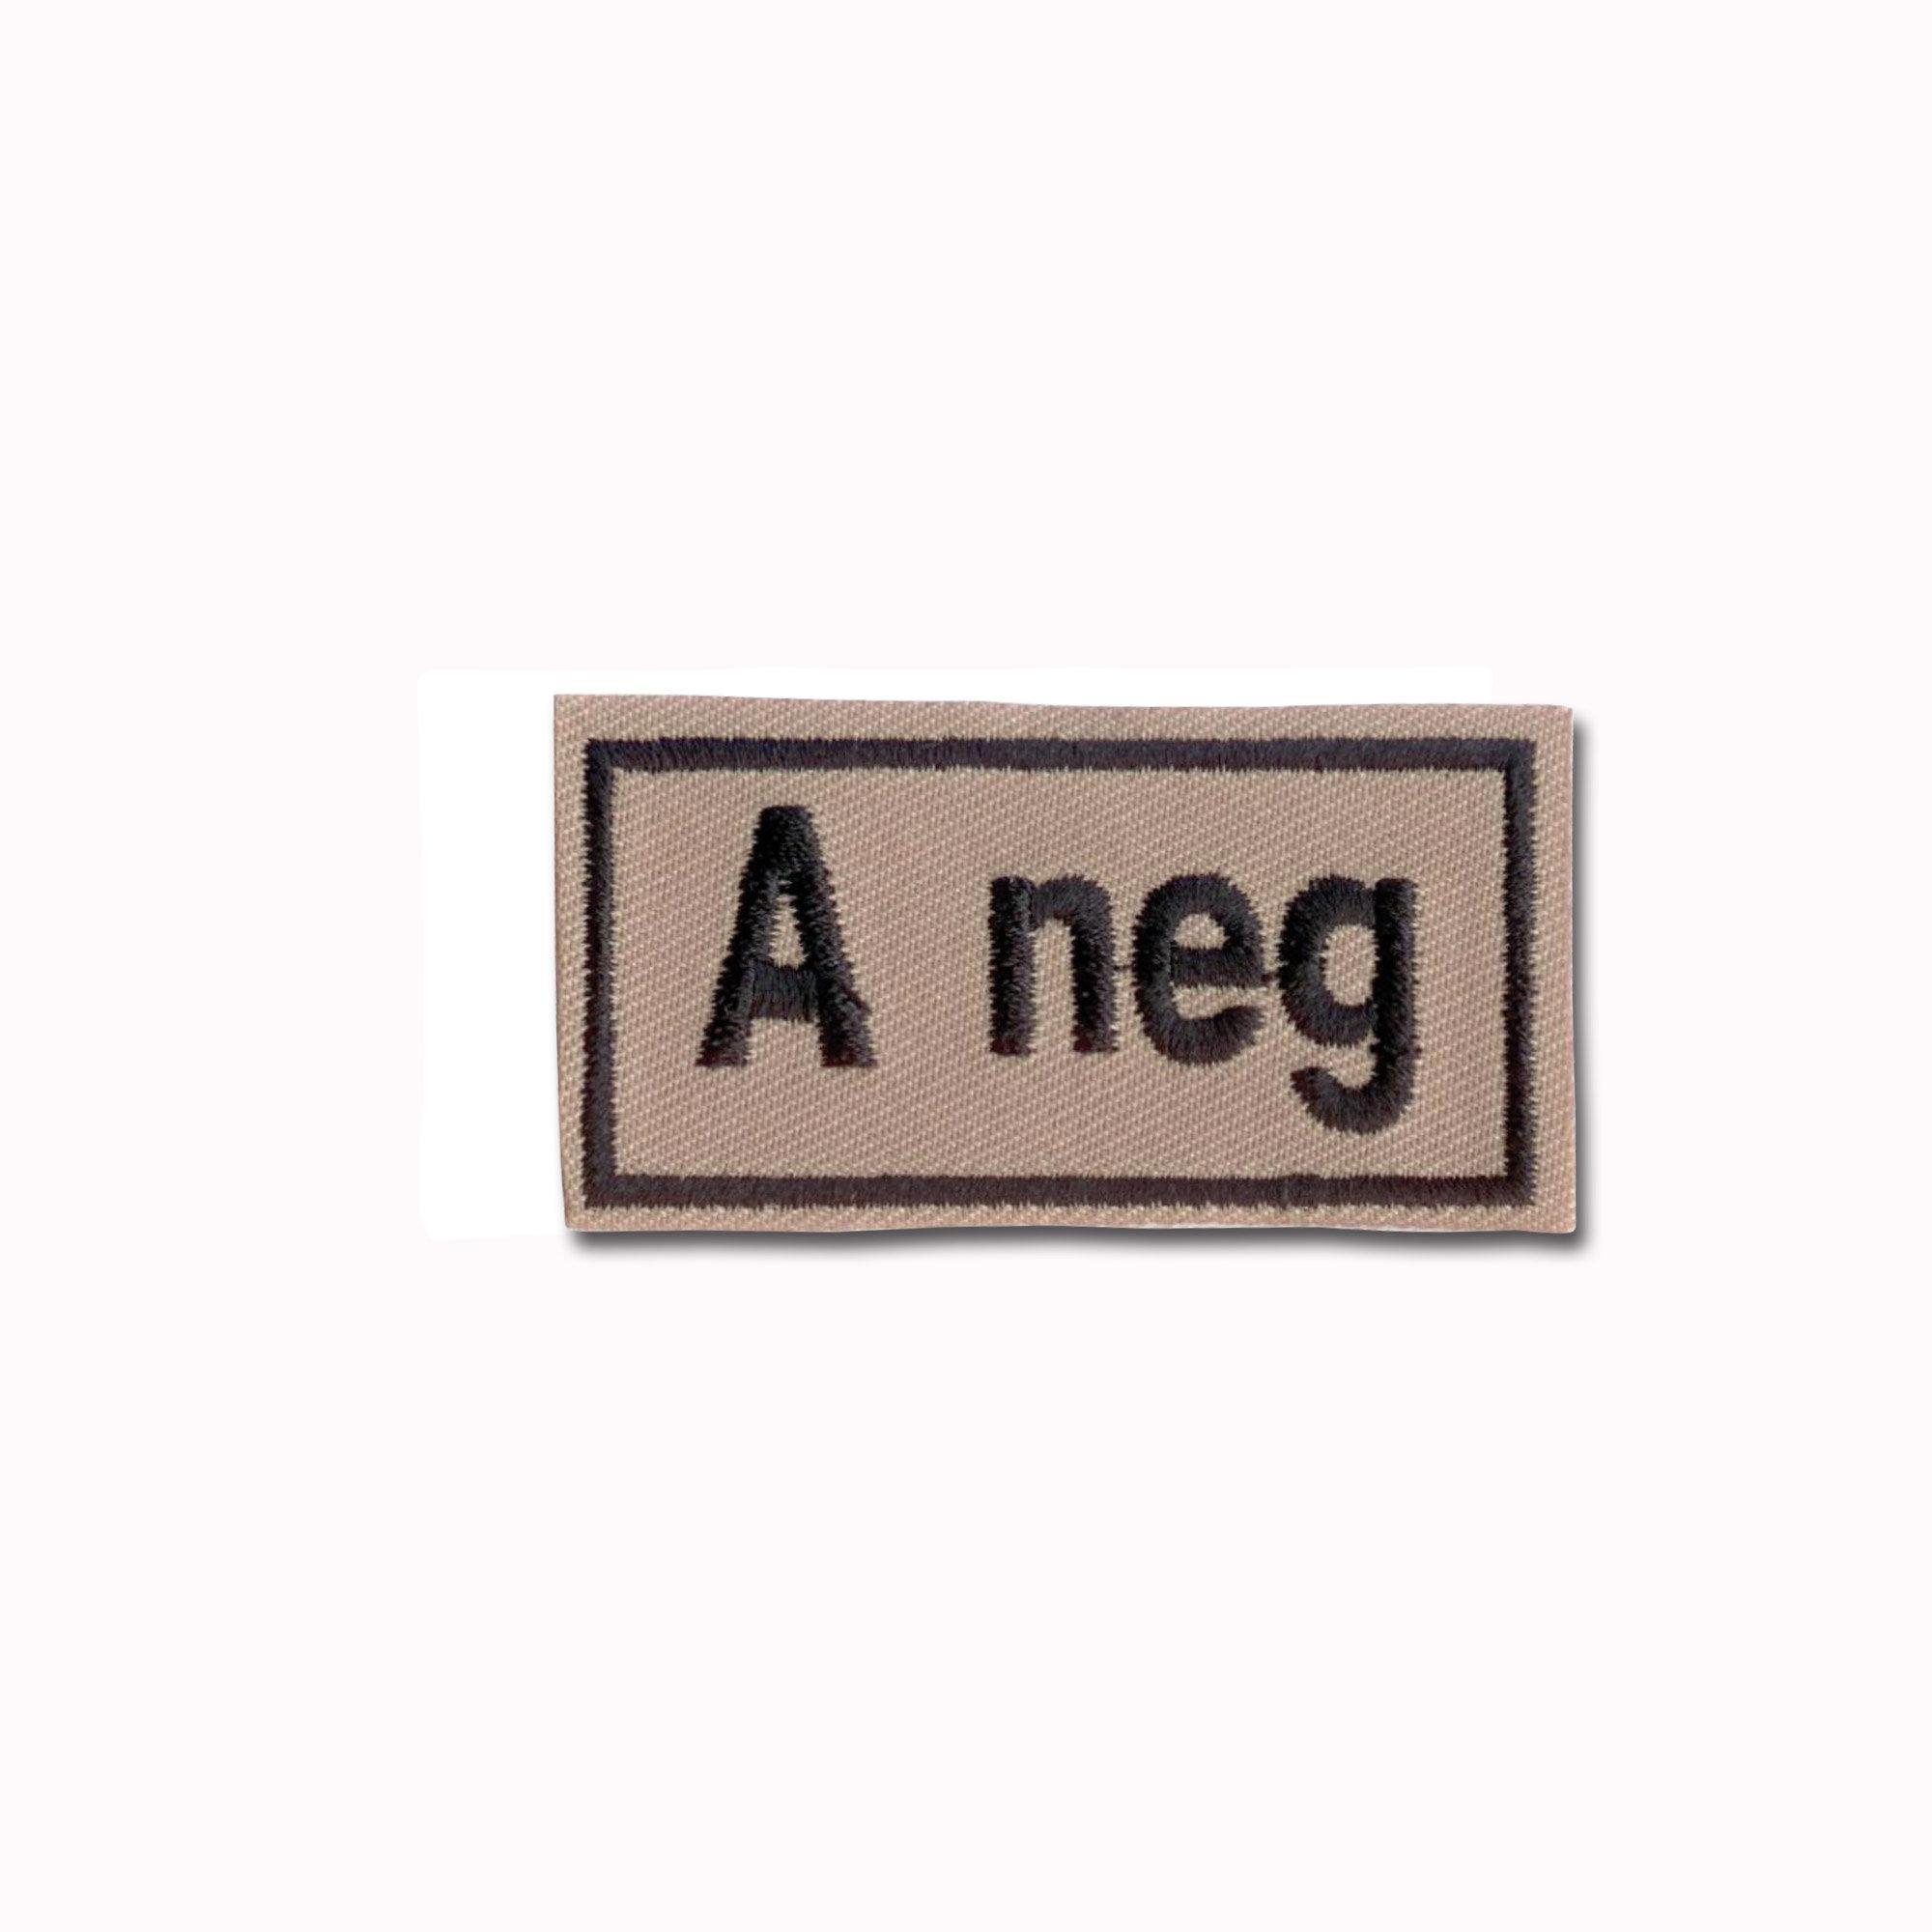 Insigne Groupe sanguin A neg beige